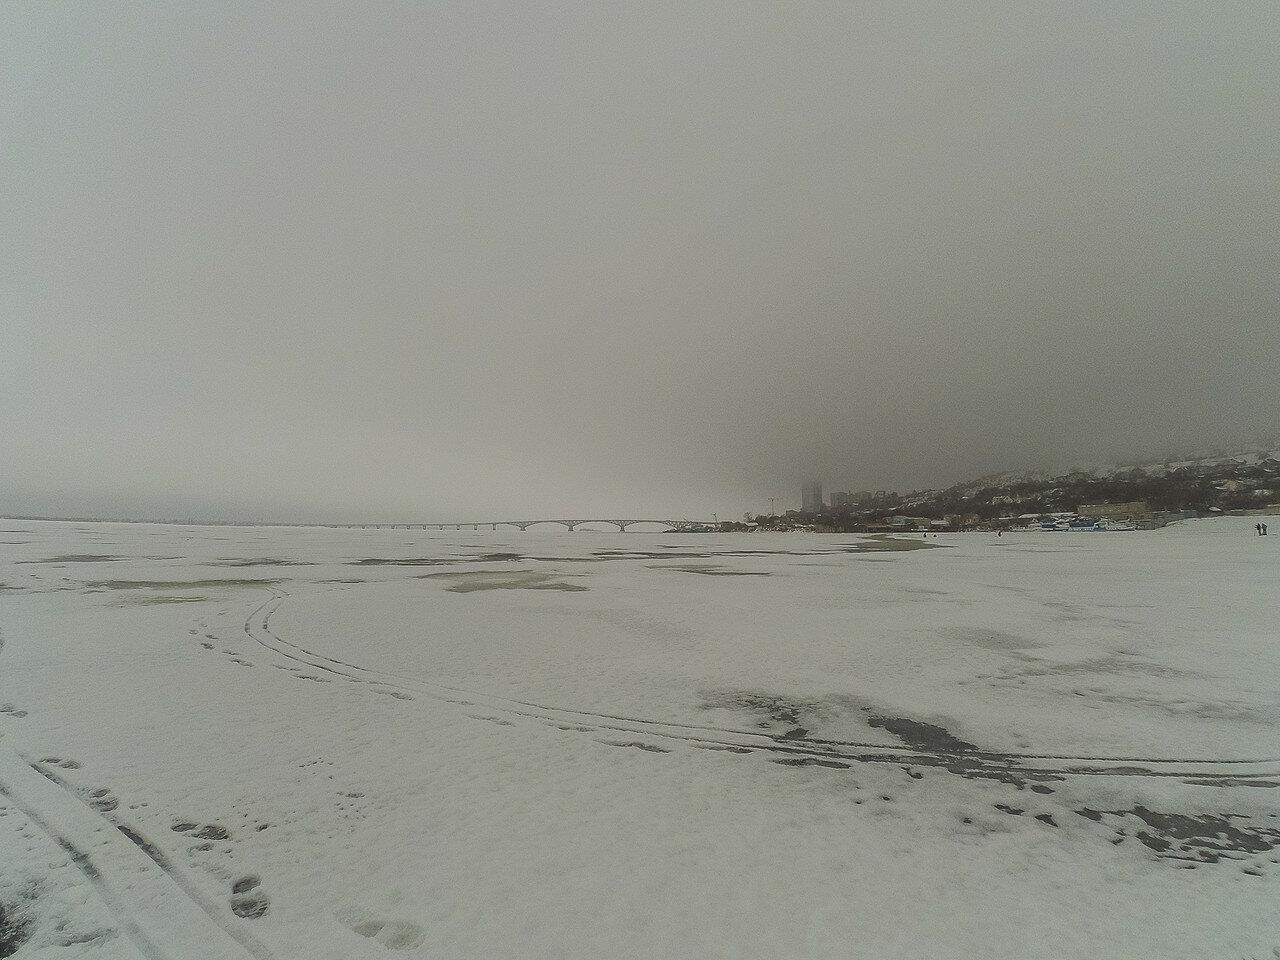 Туманные перспективы фото 13